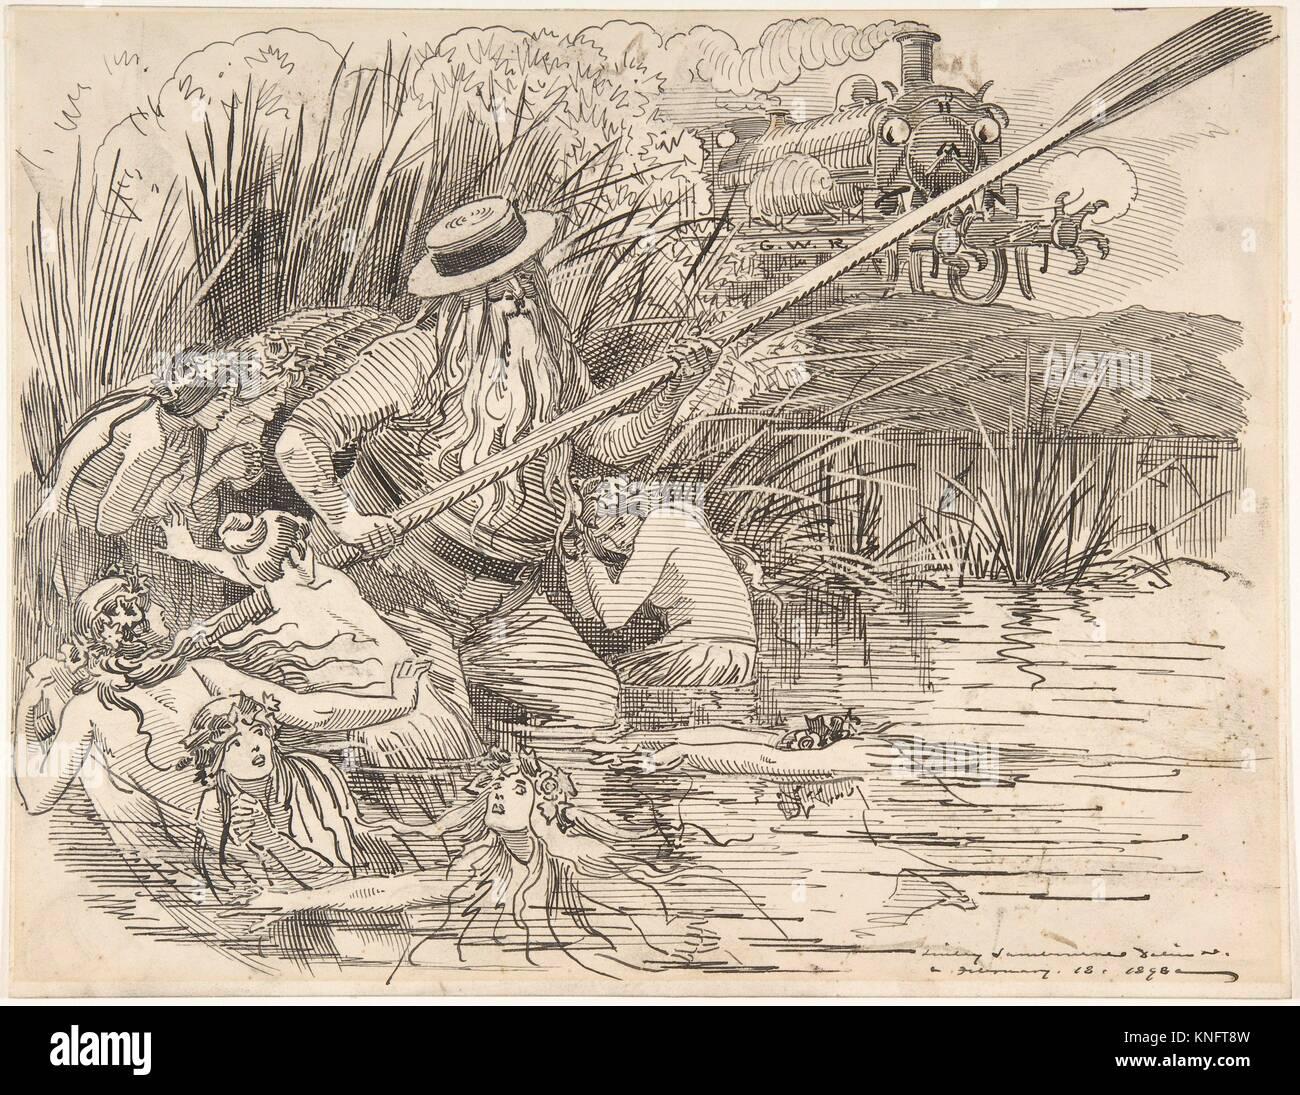 Cartoon for Punch (The Great Western Railway), Feb. 18, 1898. Artist: Sir (Edward) Linley Sambourne (British, London - Stock Image